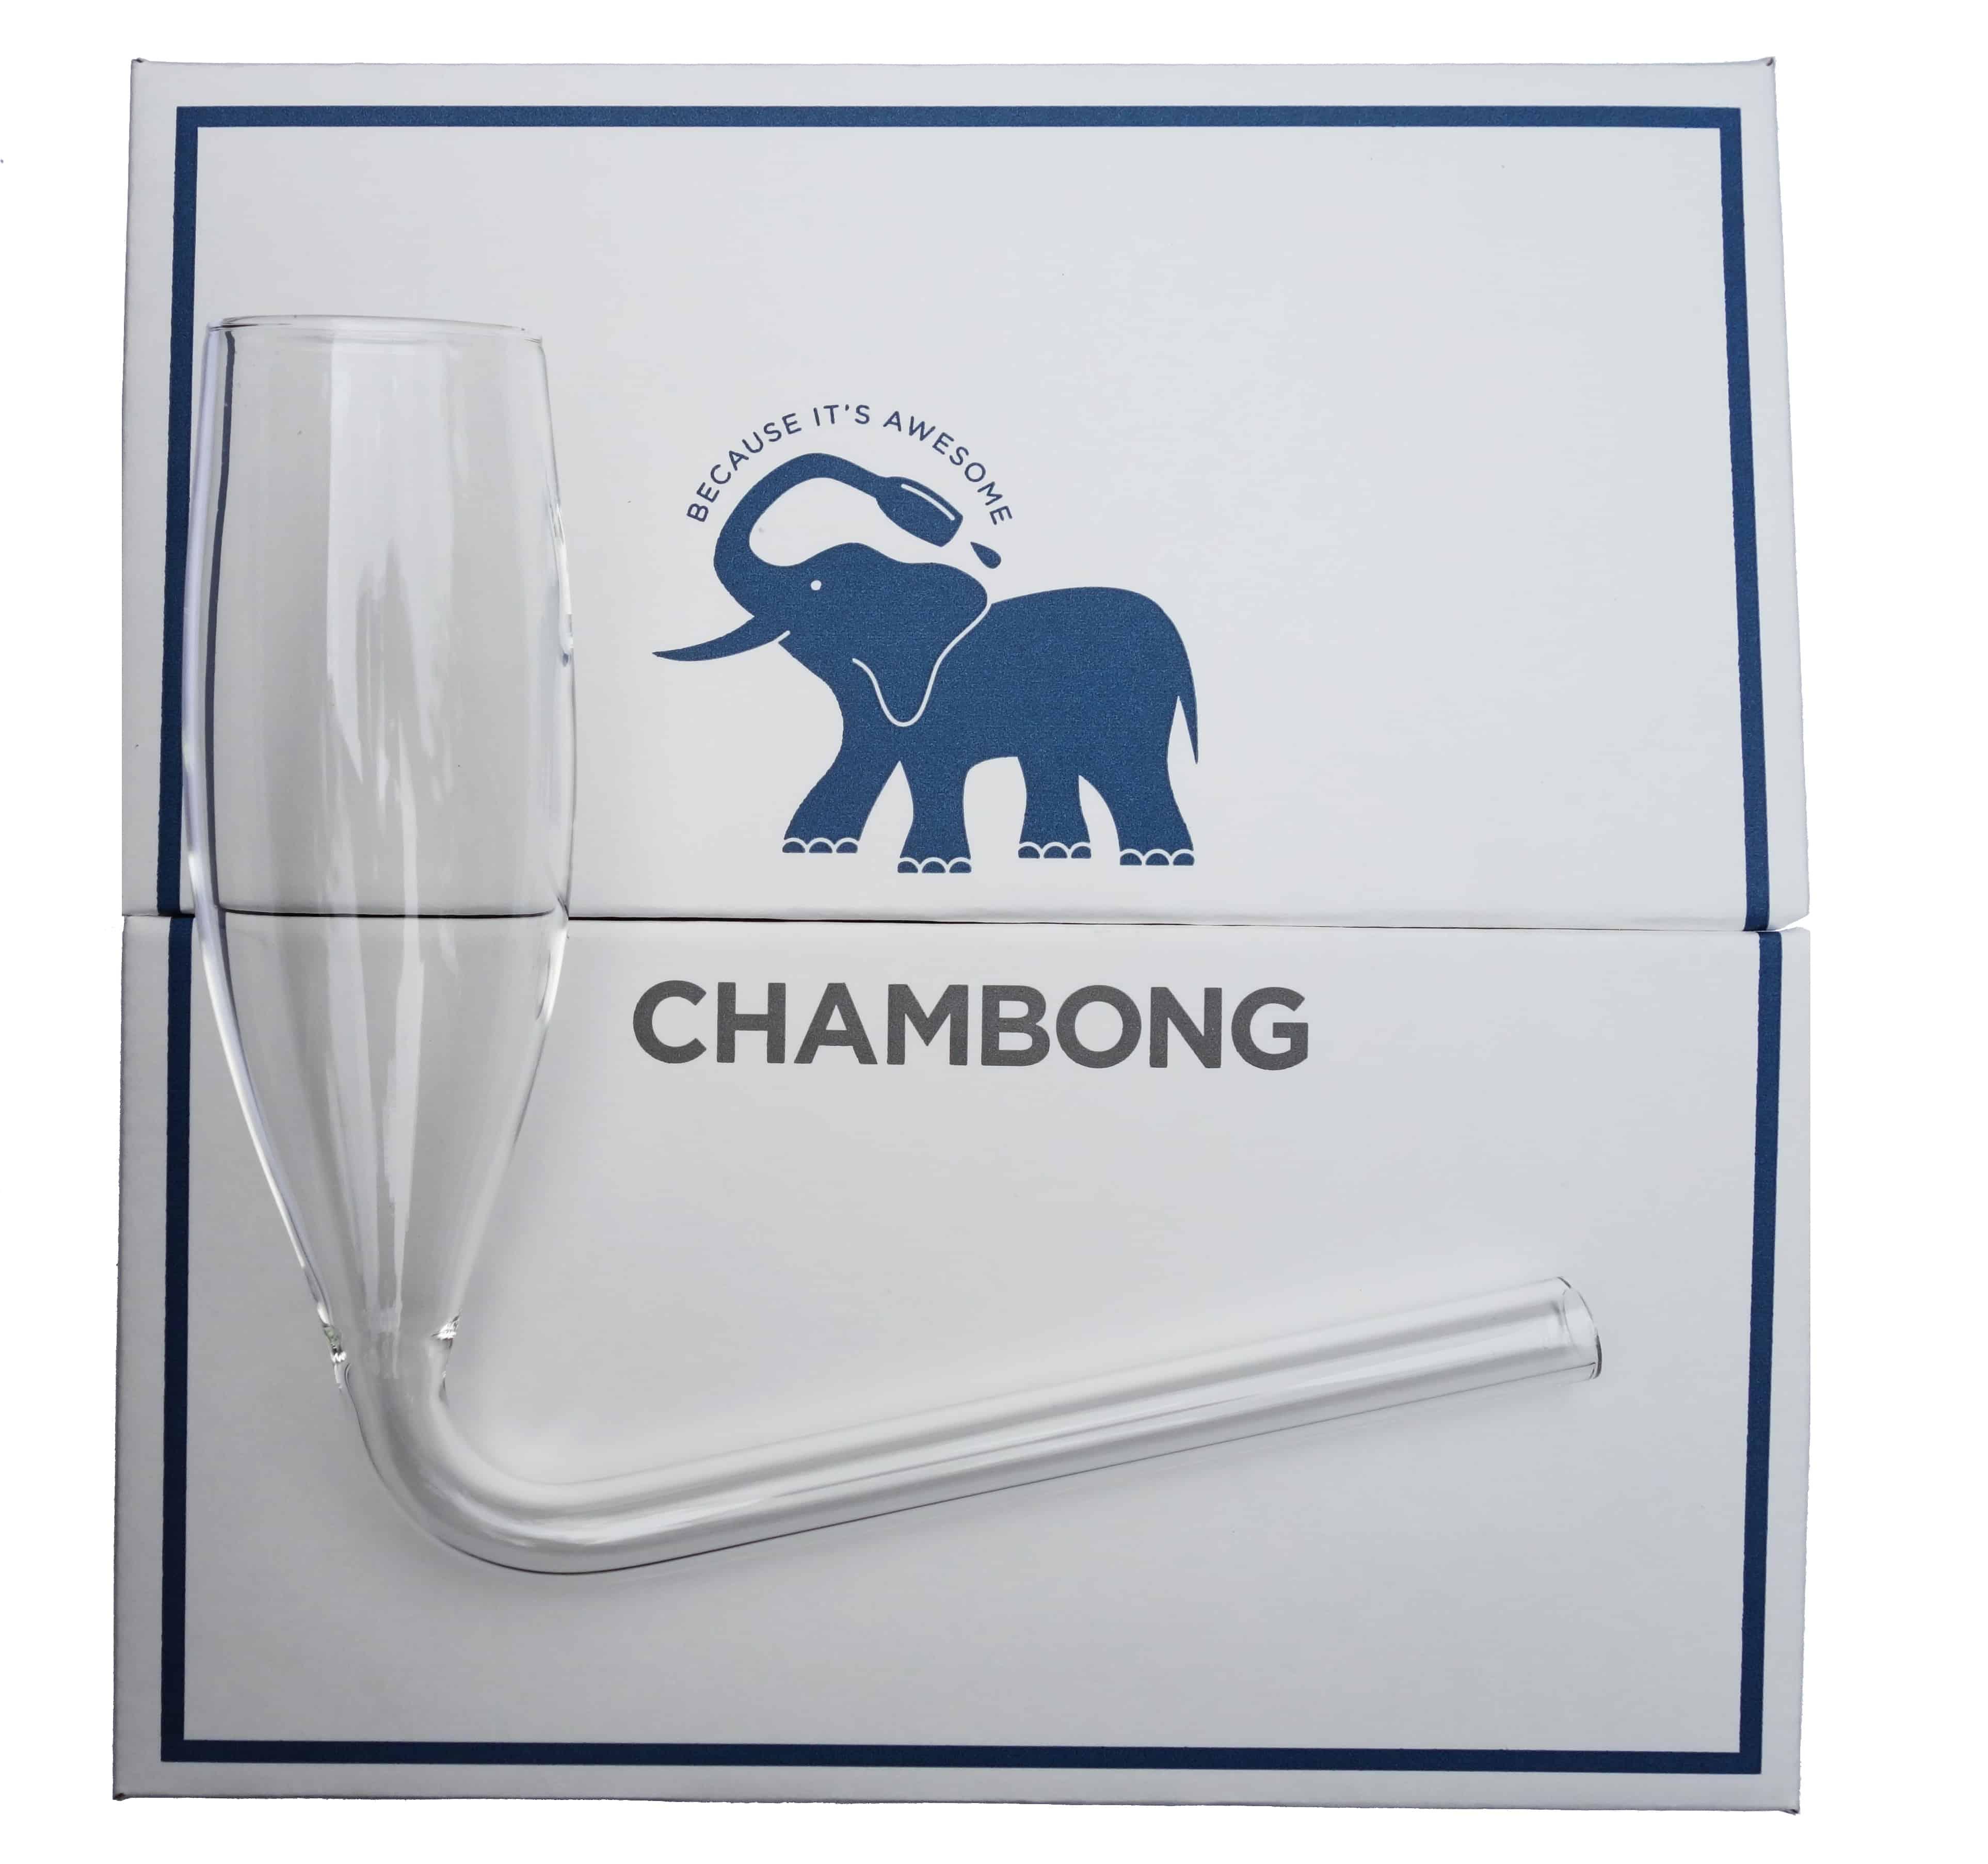 Chambong Champagne Glass Blue Elephant